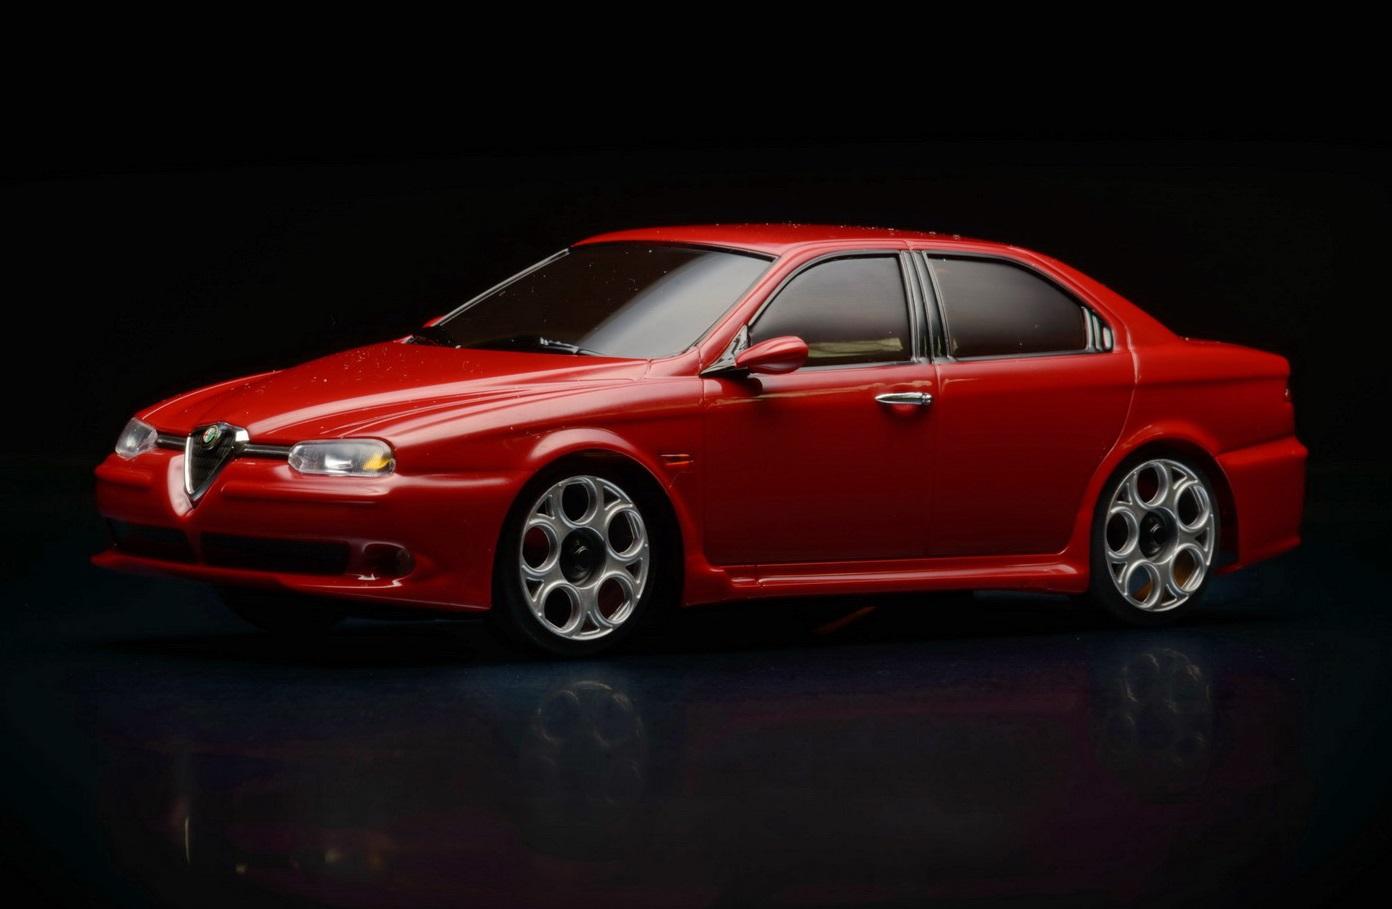 Alfa romeo 156 2001 2003 diesel 2 4 jtd 150 cv for Alfa romeo salon de provence